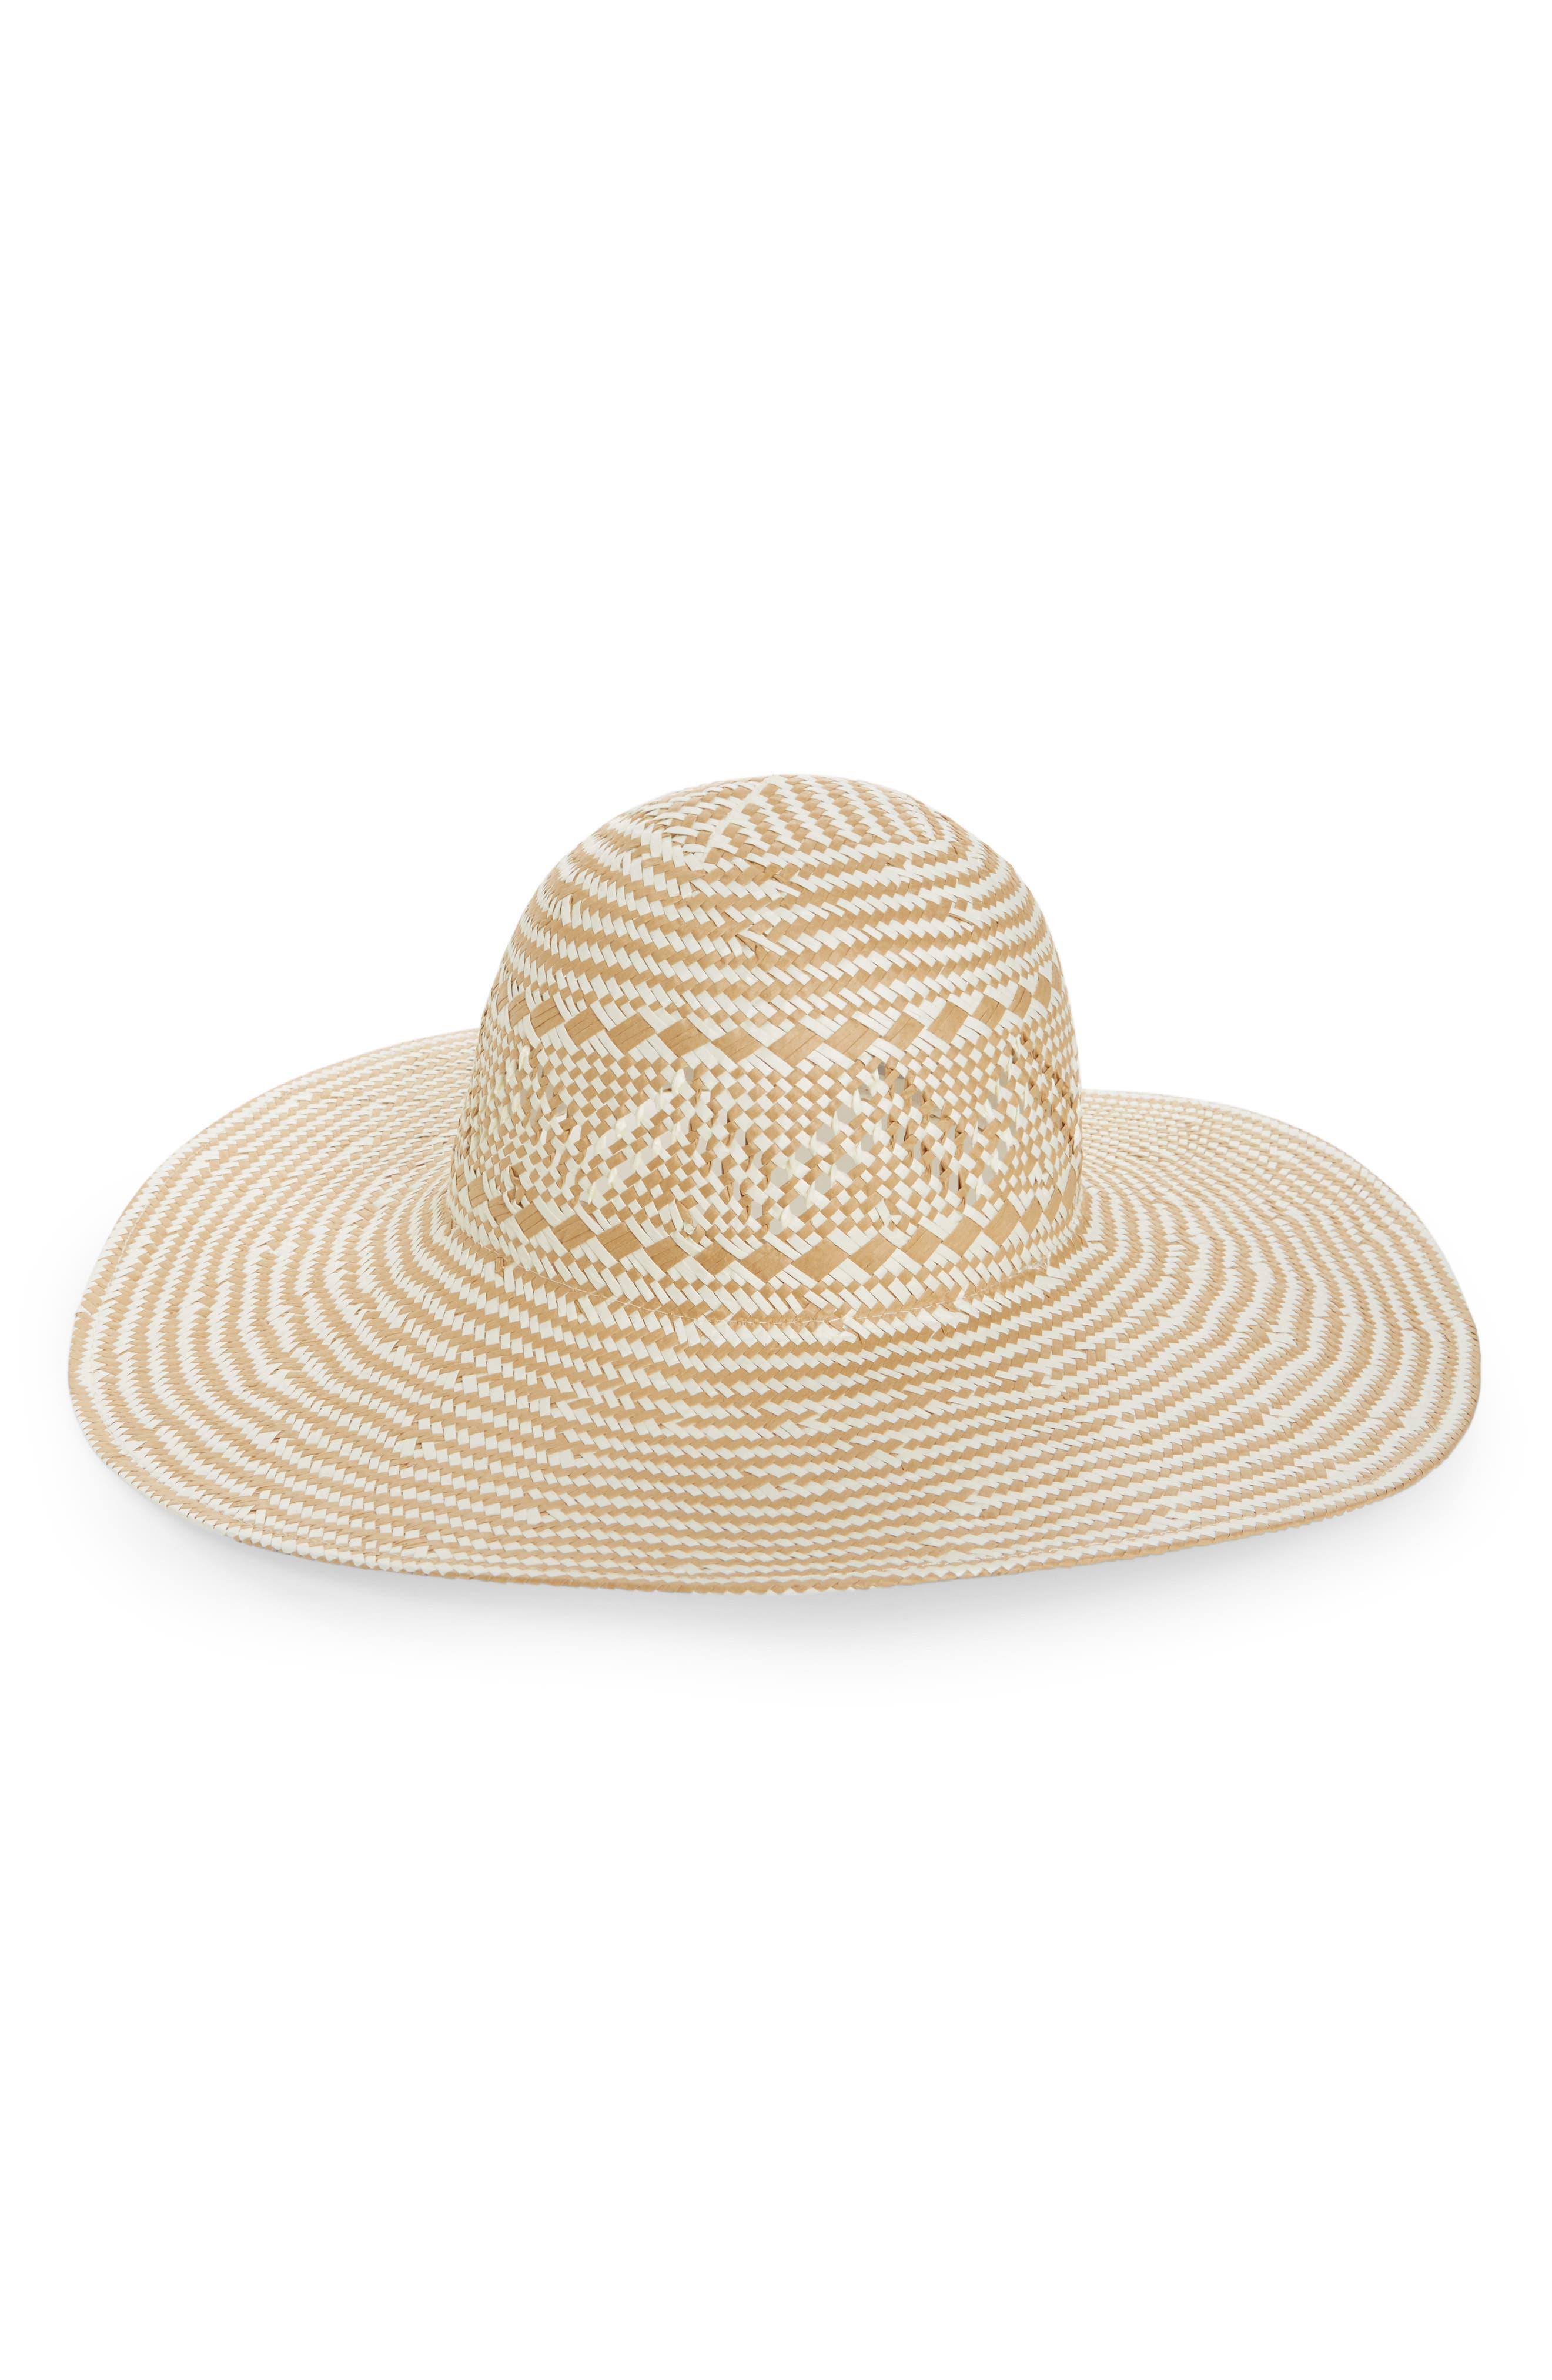 Nordstrom Two-Tone Floppy Straw Hat